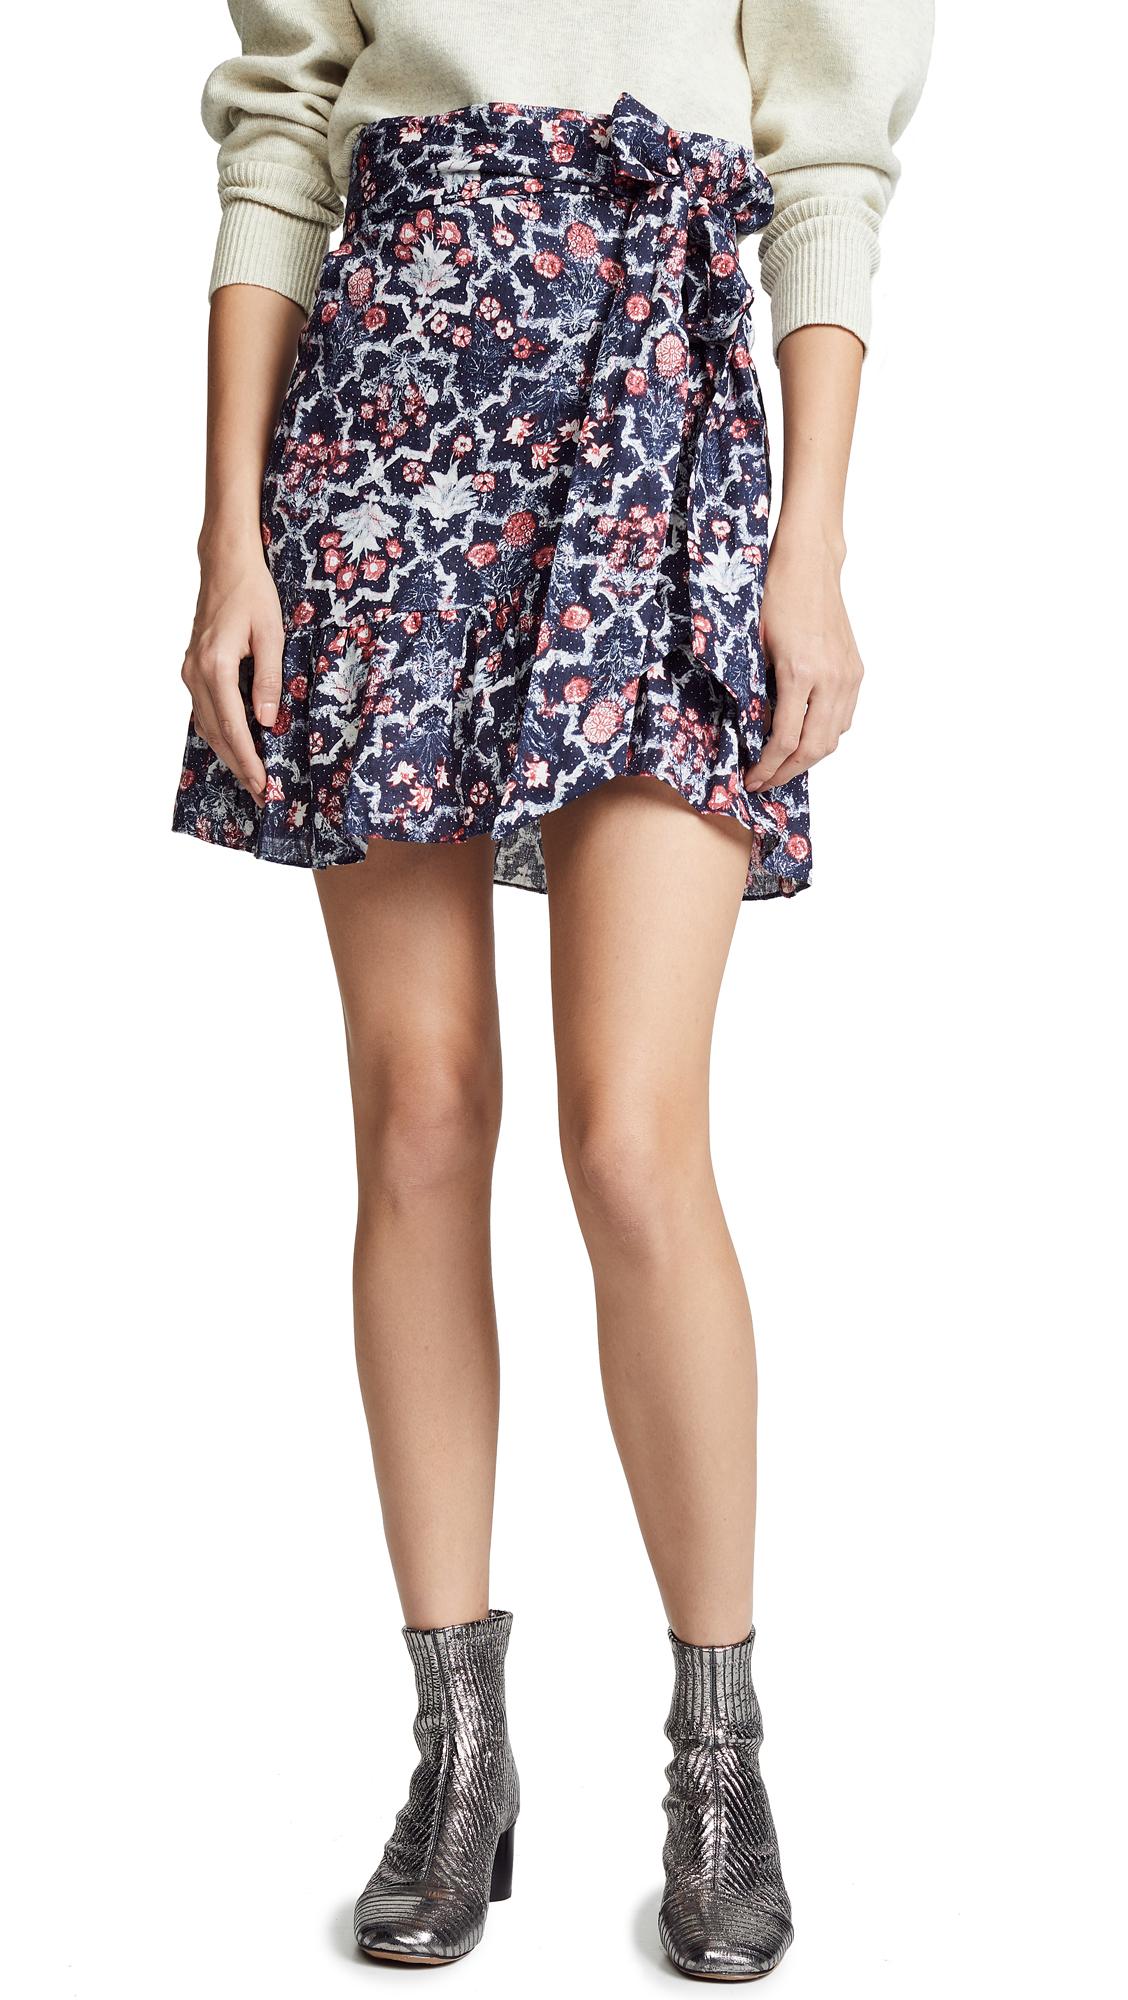 Isabel Marant Etoile Tempster Skirt - Midnight